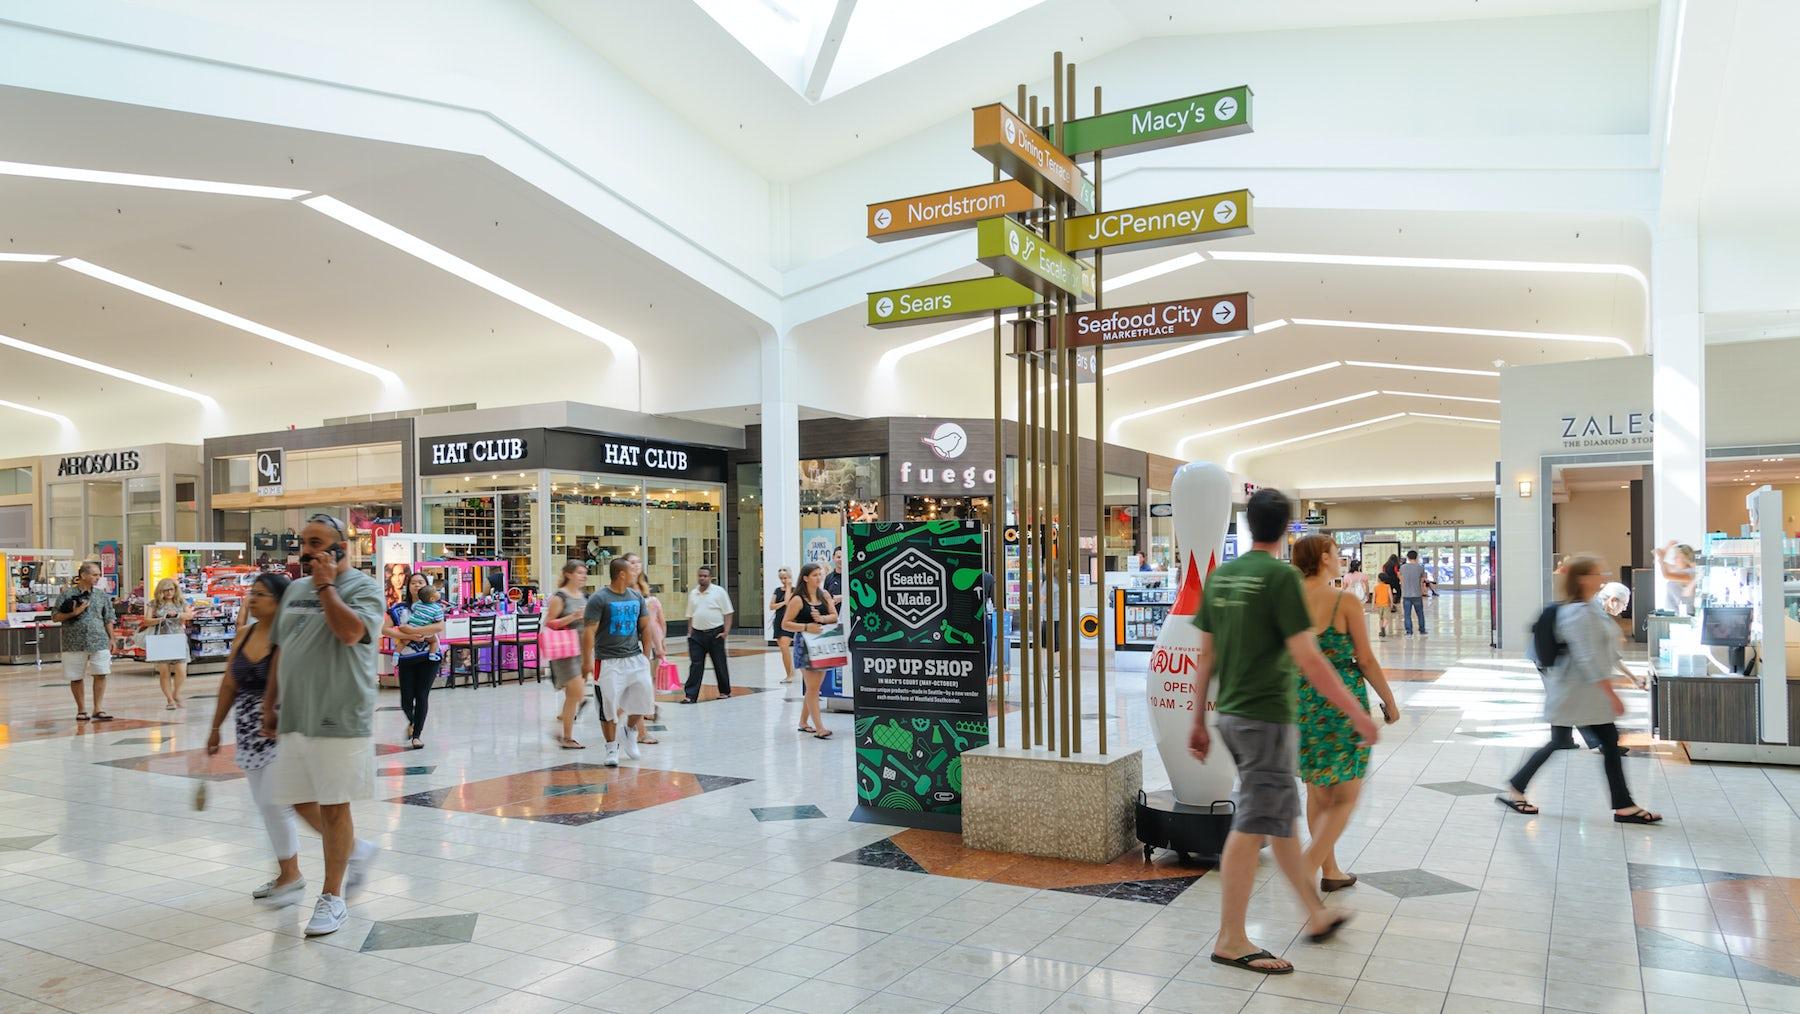 Southcenter Shopping Mall in Tukwila, Washington | Source: Shutterstock